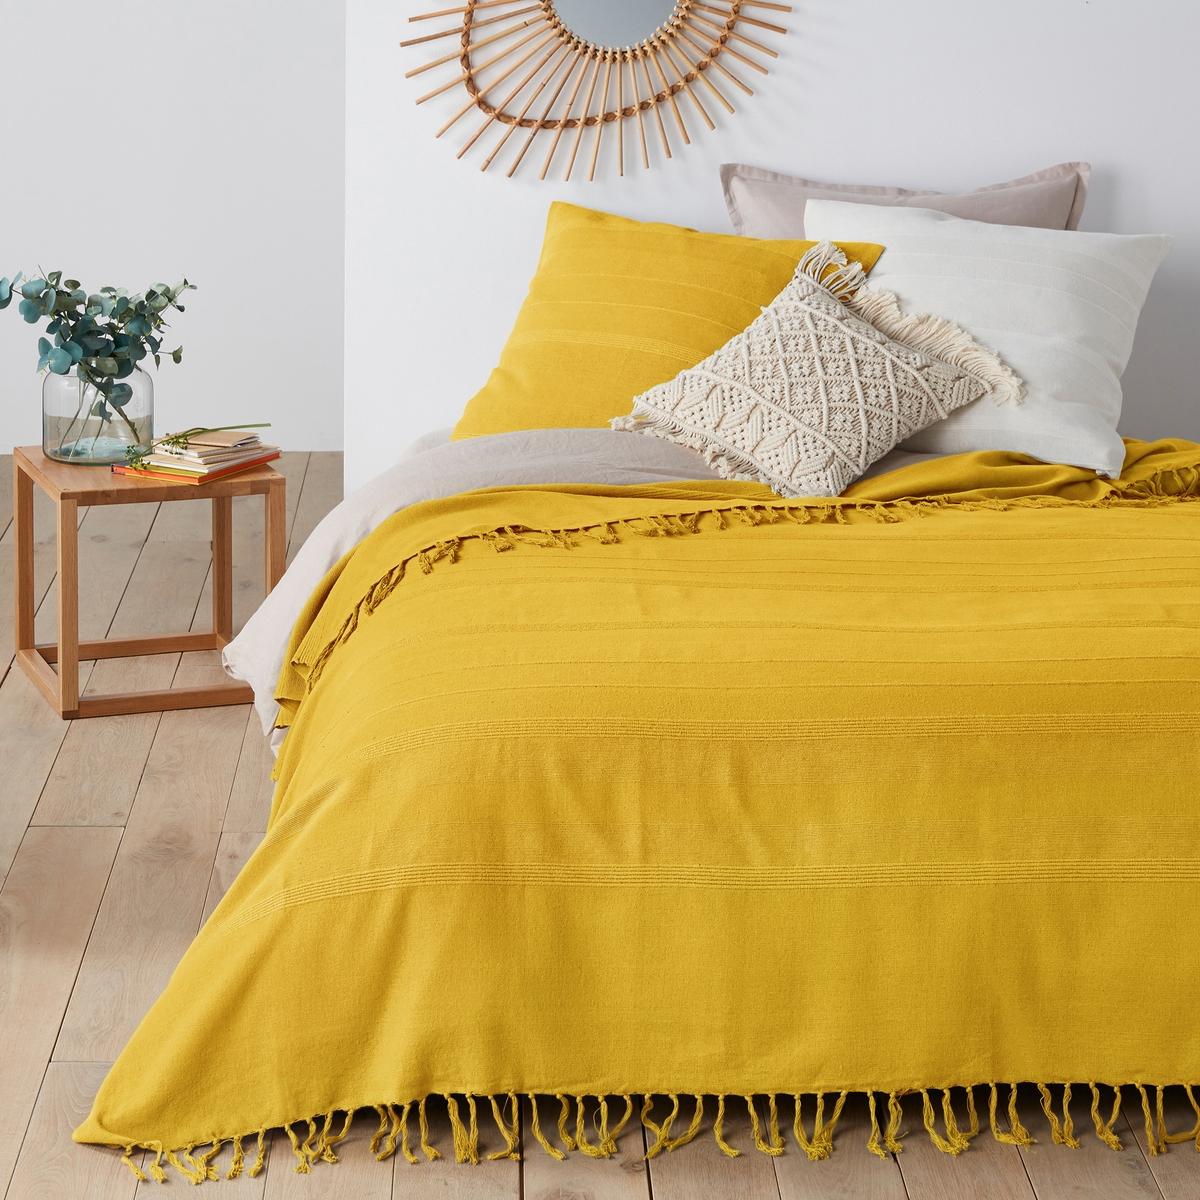 Фото - Покрывало LaRedoute С бахромой Nedo 230 x 250 см желтый покрывало laredoute стеганое из 100 хлопка scenario 230 x 250 см белый